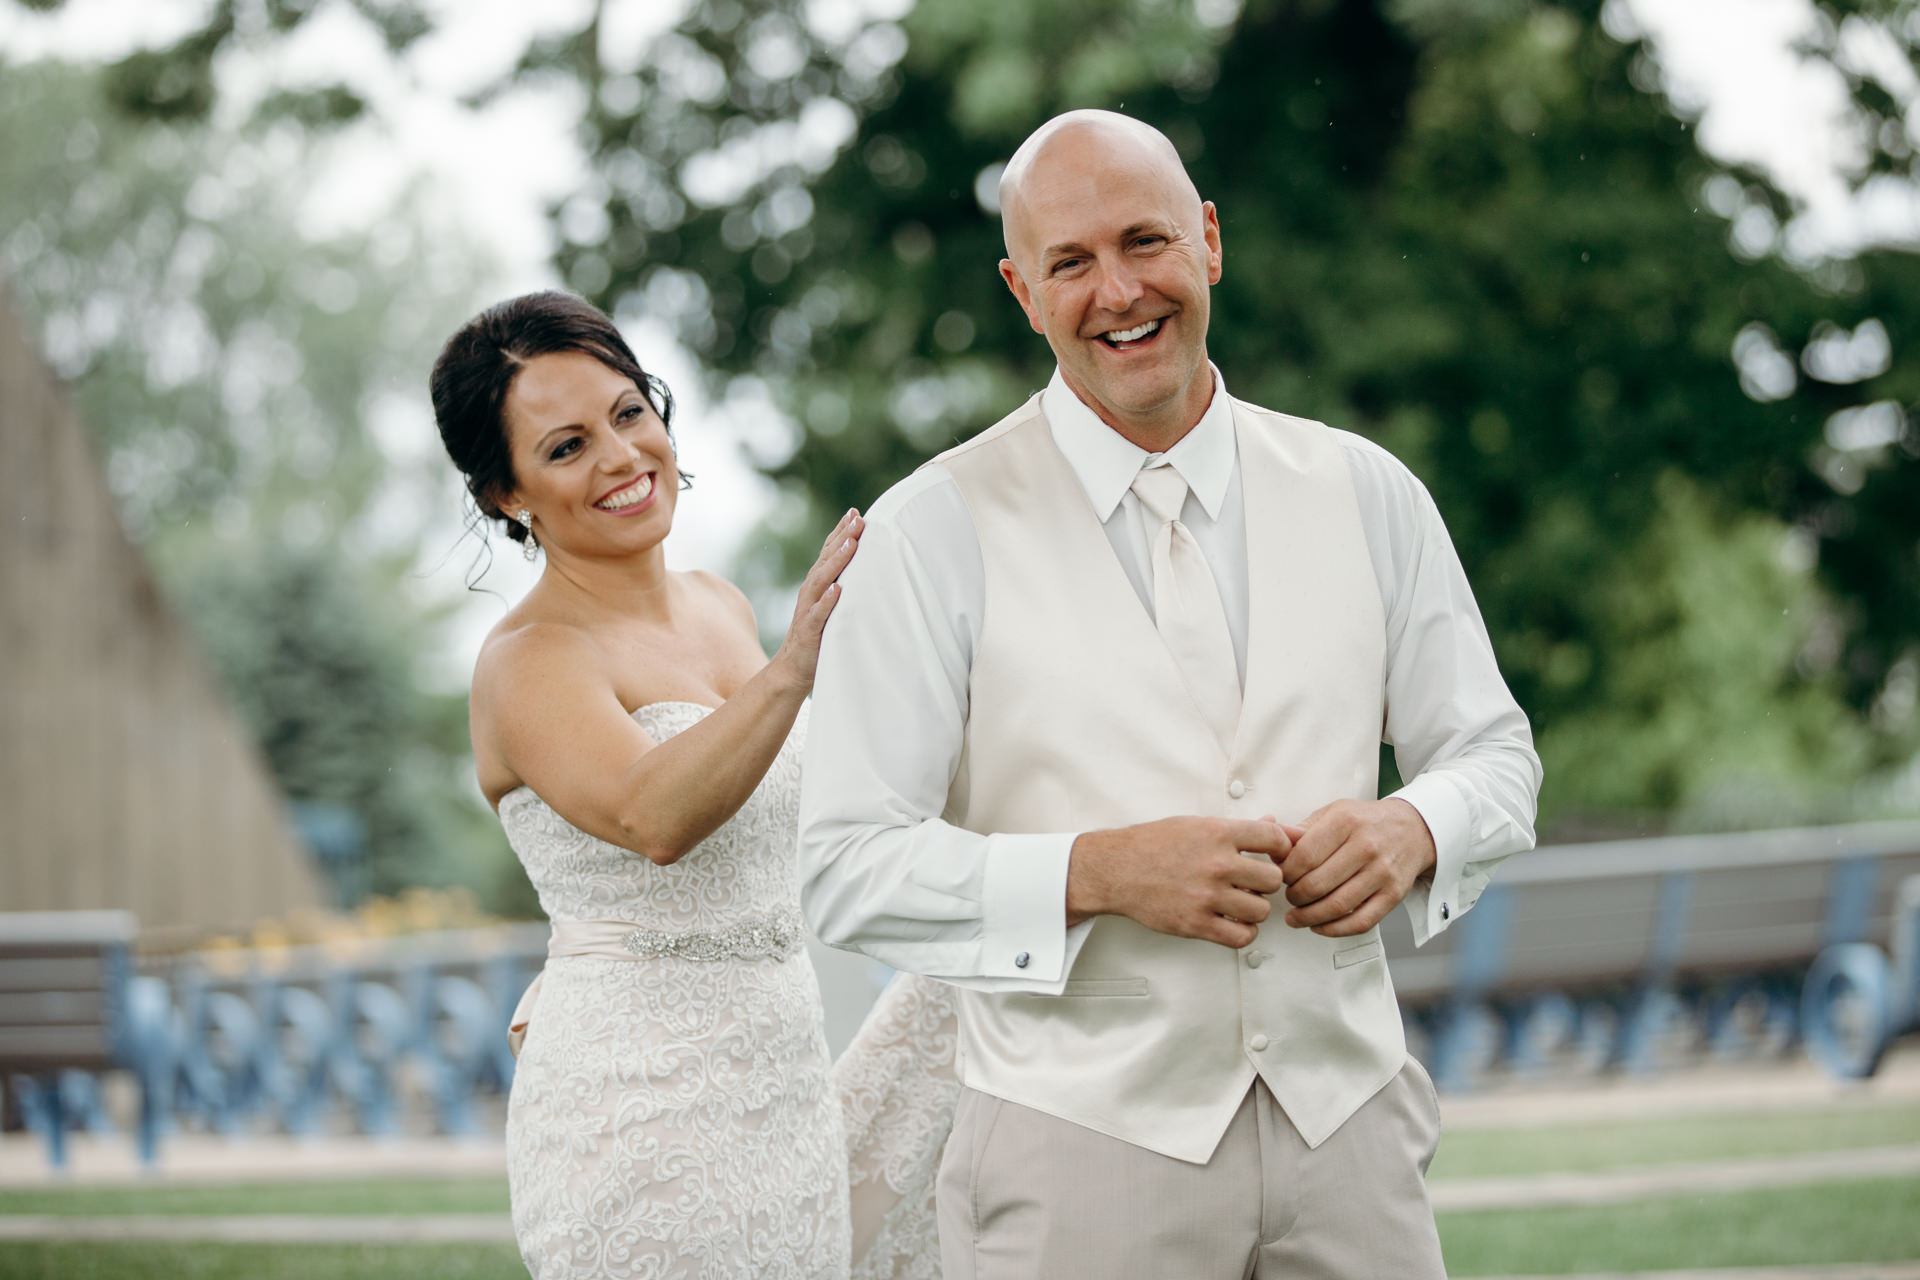 Grant Beachy Tammy Chris wedding photography goshen Saint Joseph veranda whitcomb-022.jpg